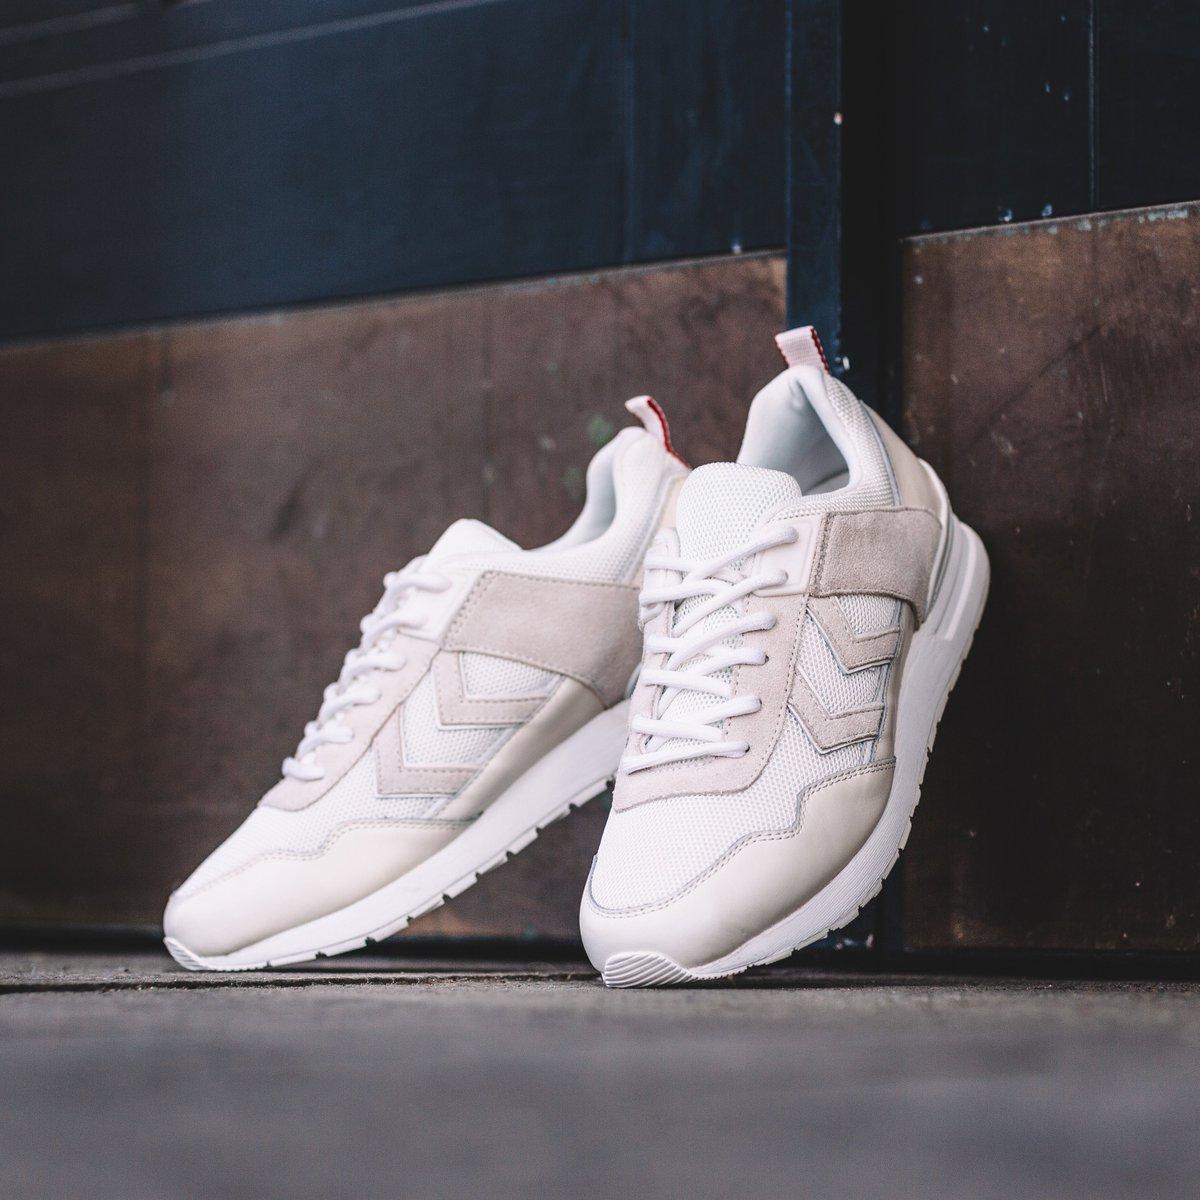 #Sneakers Sortie de la Marathona II Premium aujourd&#39;hui ! Dispo chez @citadium et @BlackRainbow75 à Paris. #MarathonaPremium #kicksoftheday<br>http://pic.twitter.com/eoNdZ0pKdS